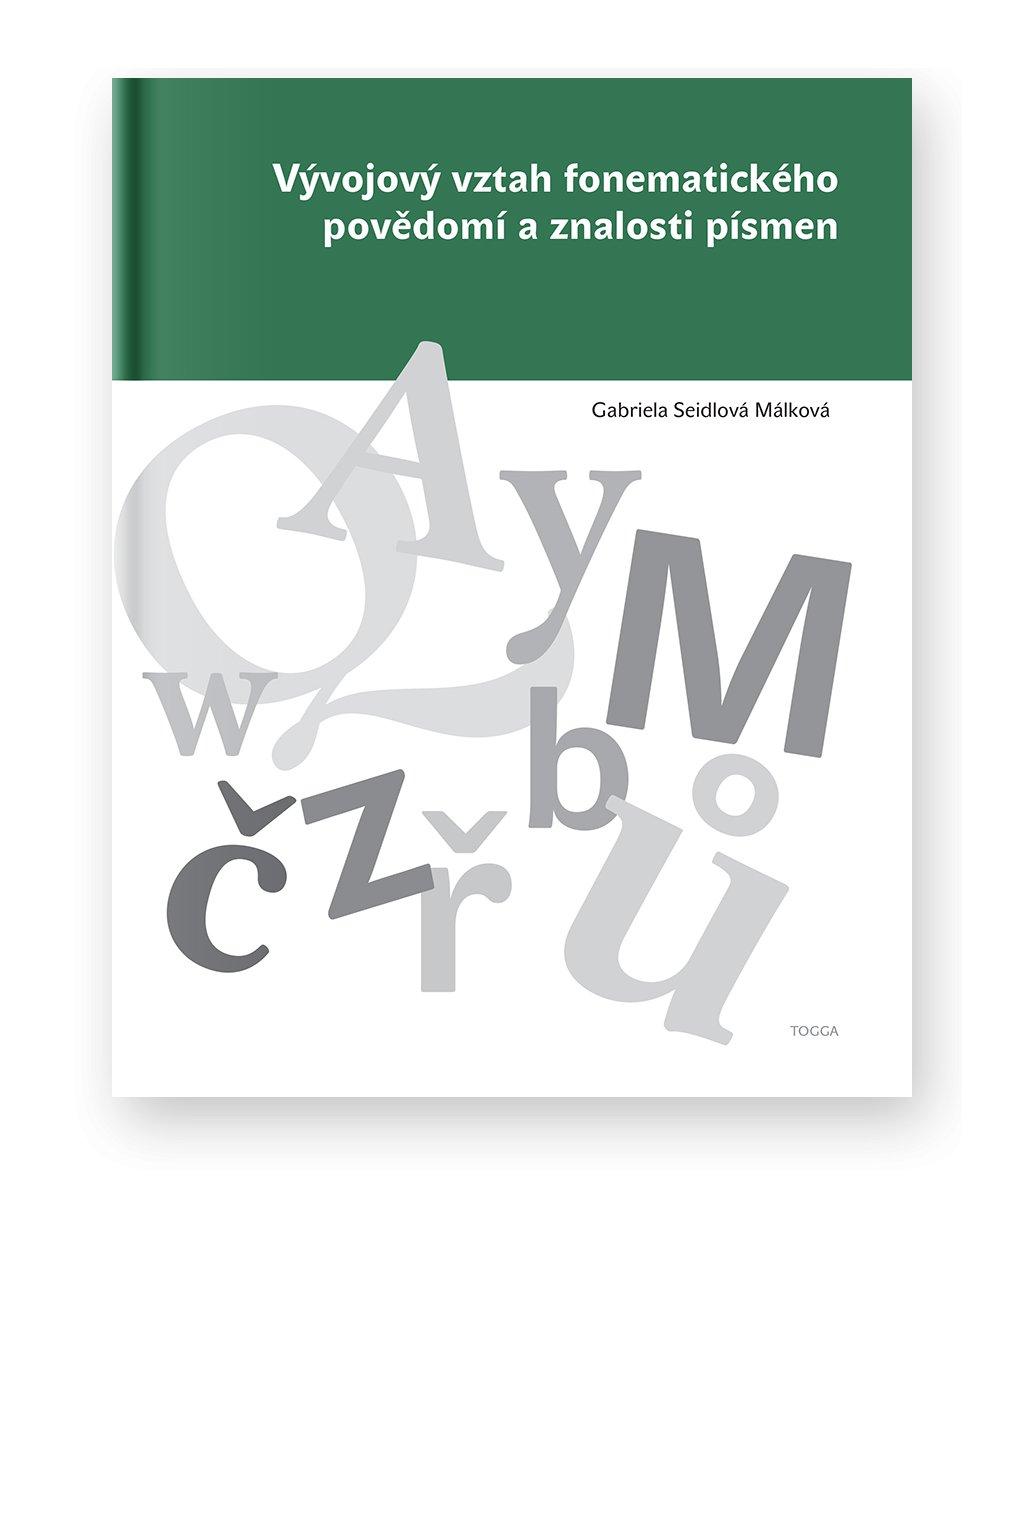 1086 vyvojovy vztah fonematickeho povedomi a znalosti pismen